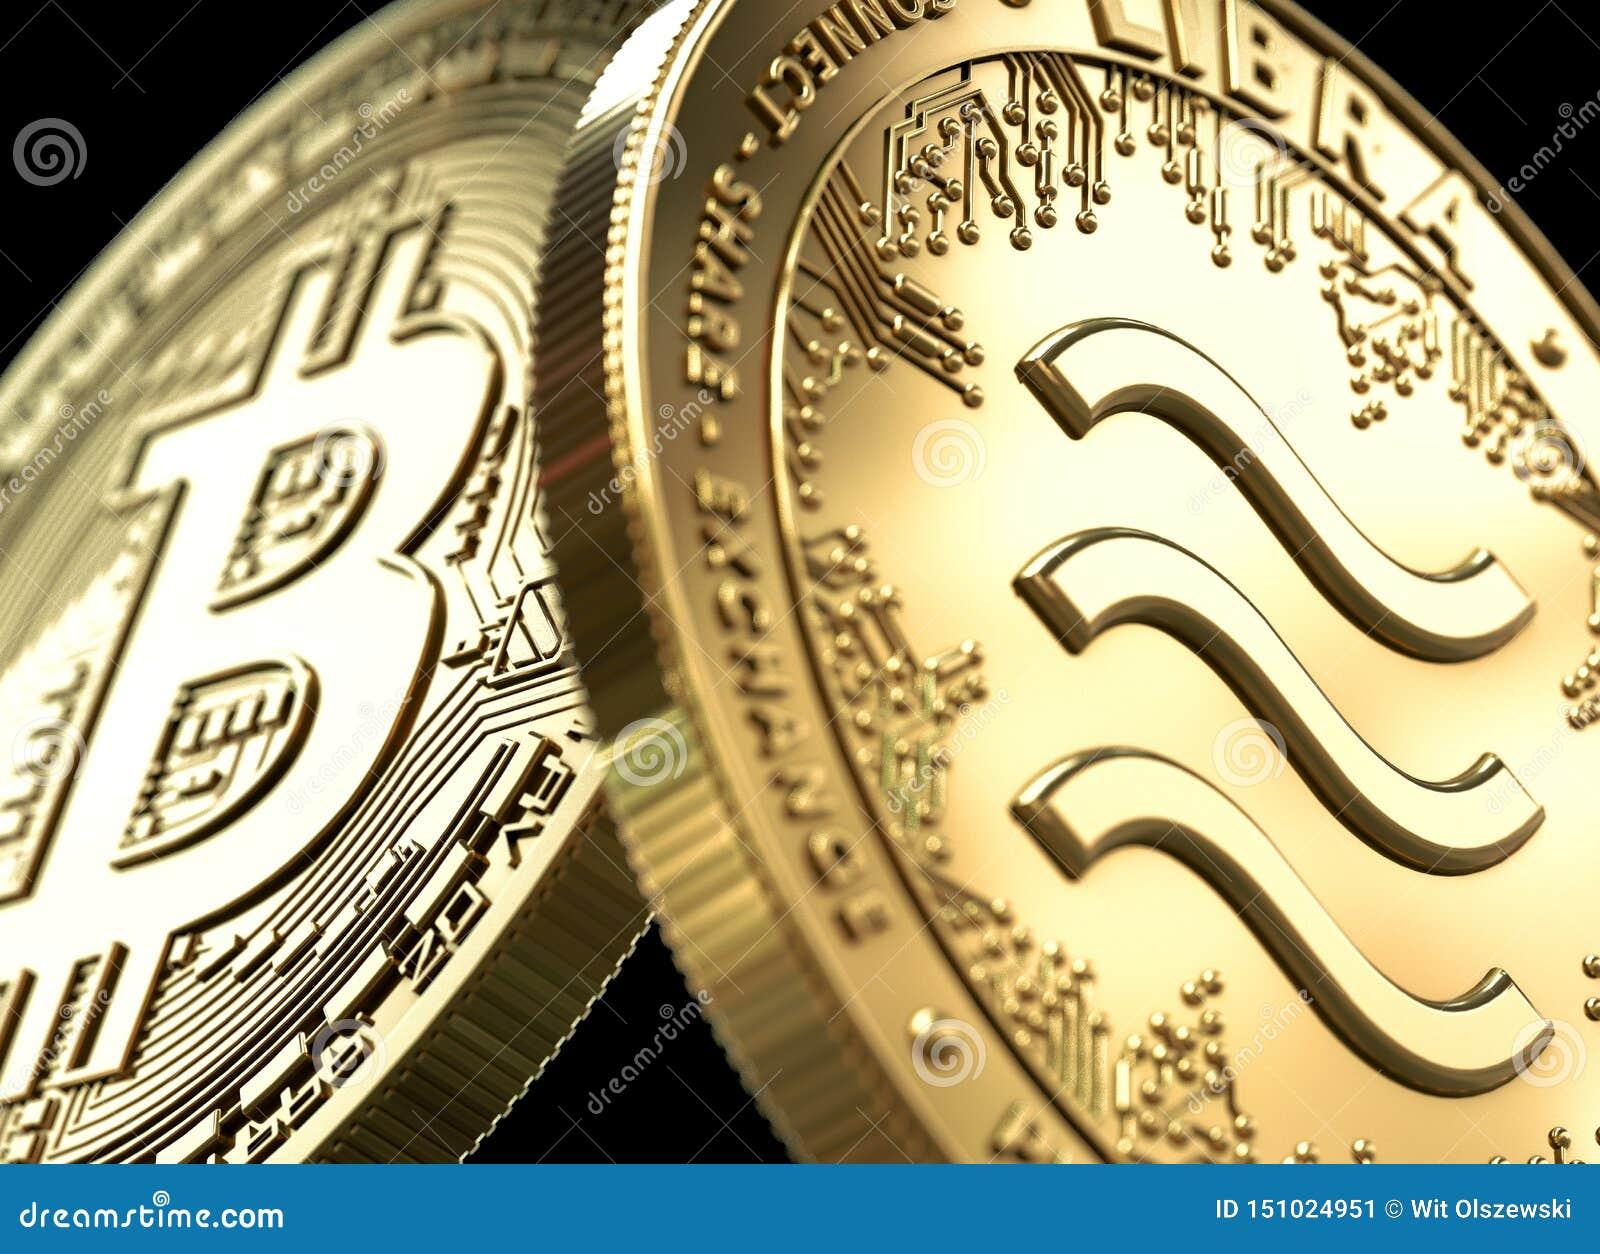 libra coin future